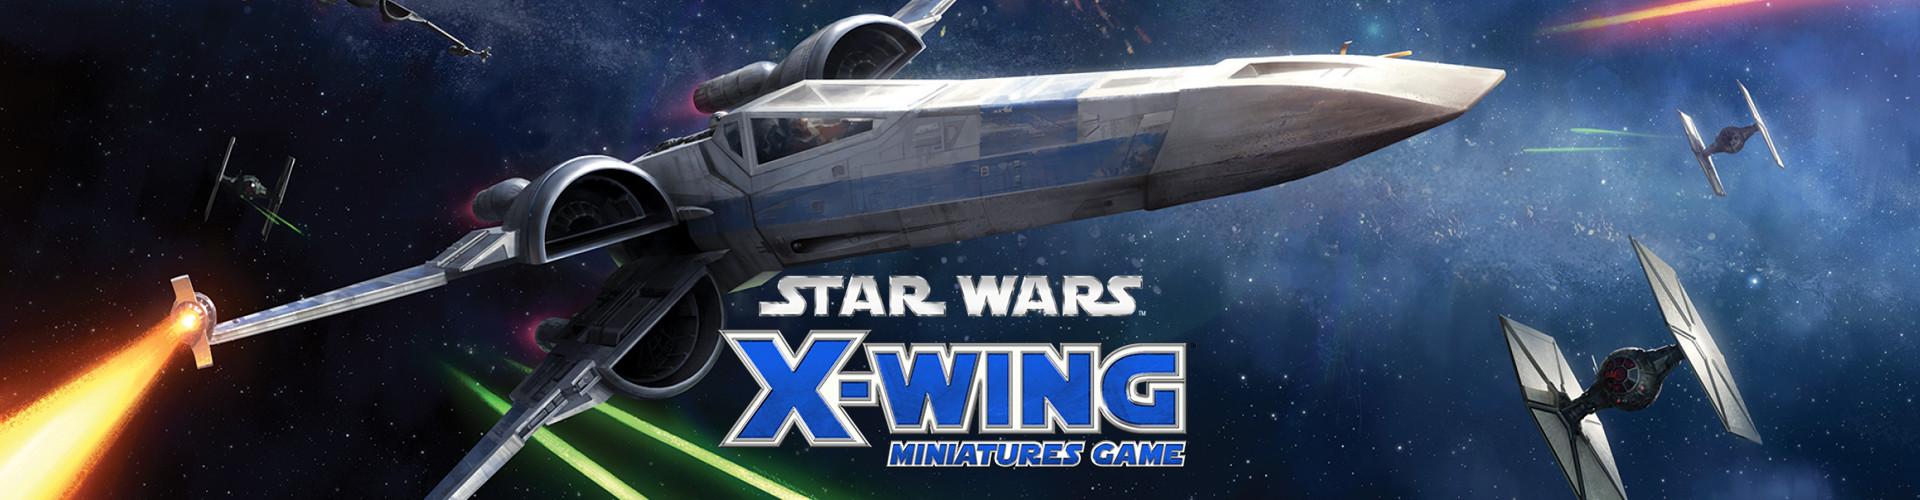 DEMO 18 star wars xwing - Demospiele: STAR WARS X-WING